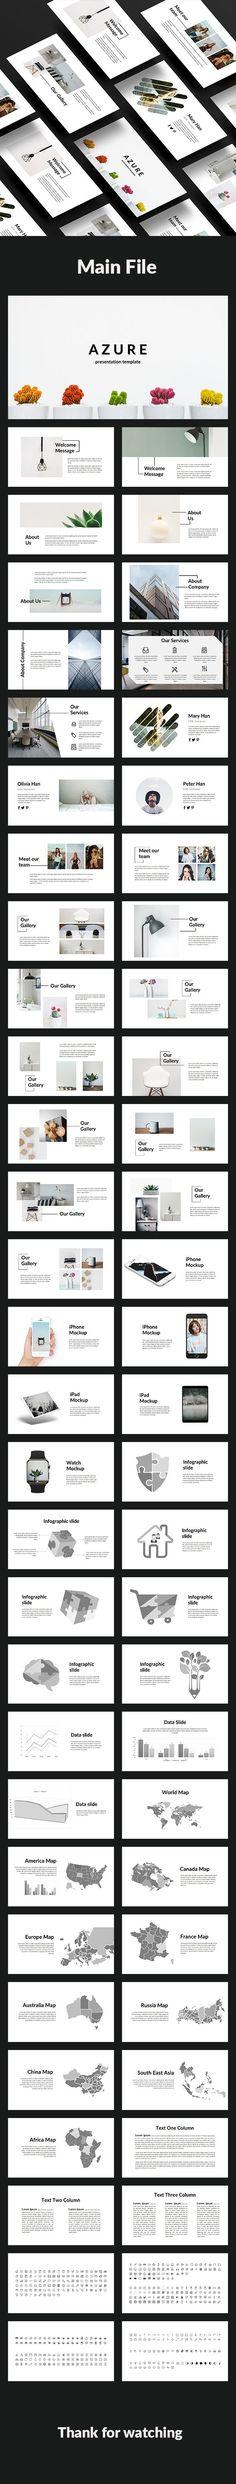 Whiteboard powerpoint toolkit whiteboard presentation templates azure creative powerpoint template toneelgroepblik Choice Image